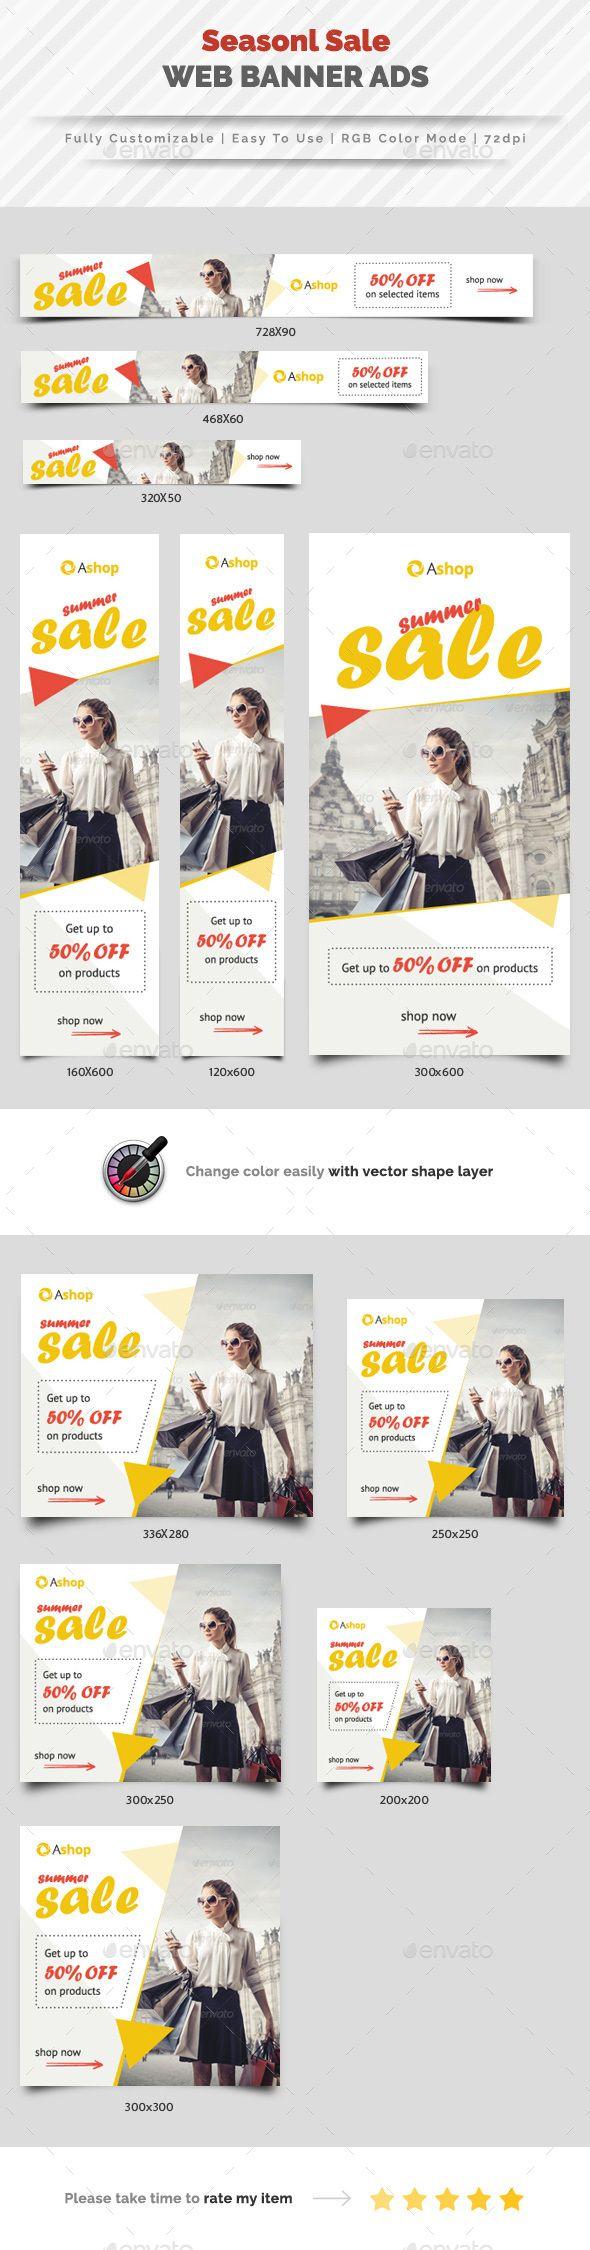 Seasonal Sale Banner Ads Template PSD #design Download: http://graphicriver.net/item/seasonal-sale-banner-ads/14430482?ref=ksioks